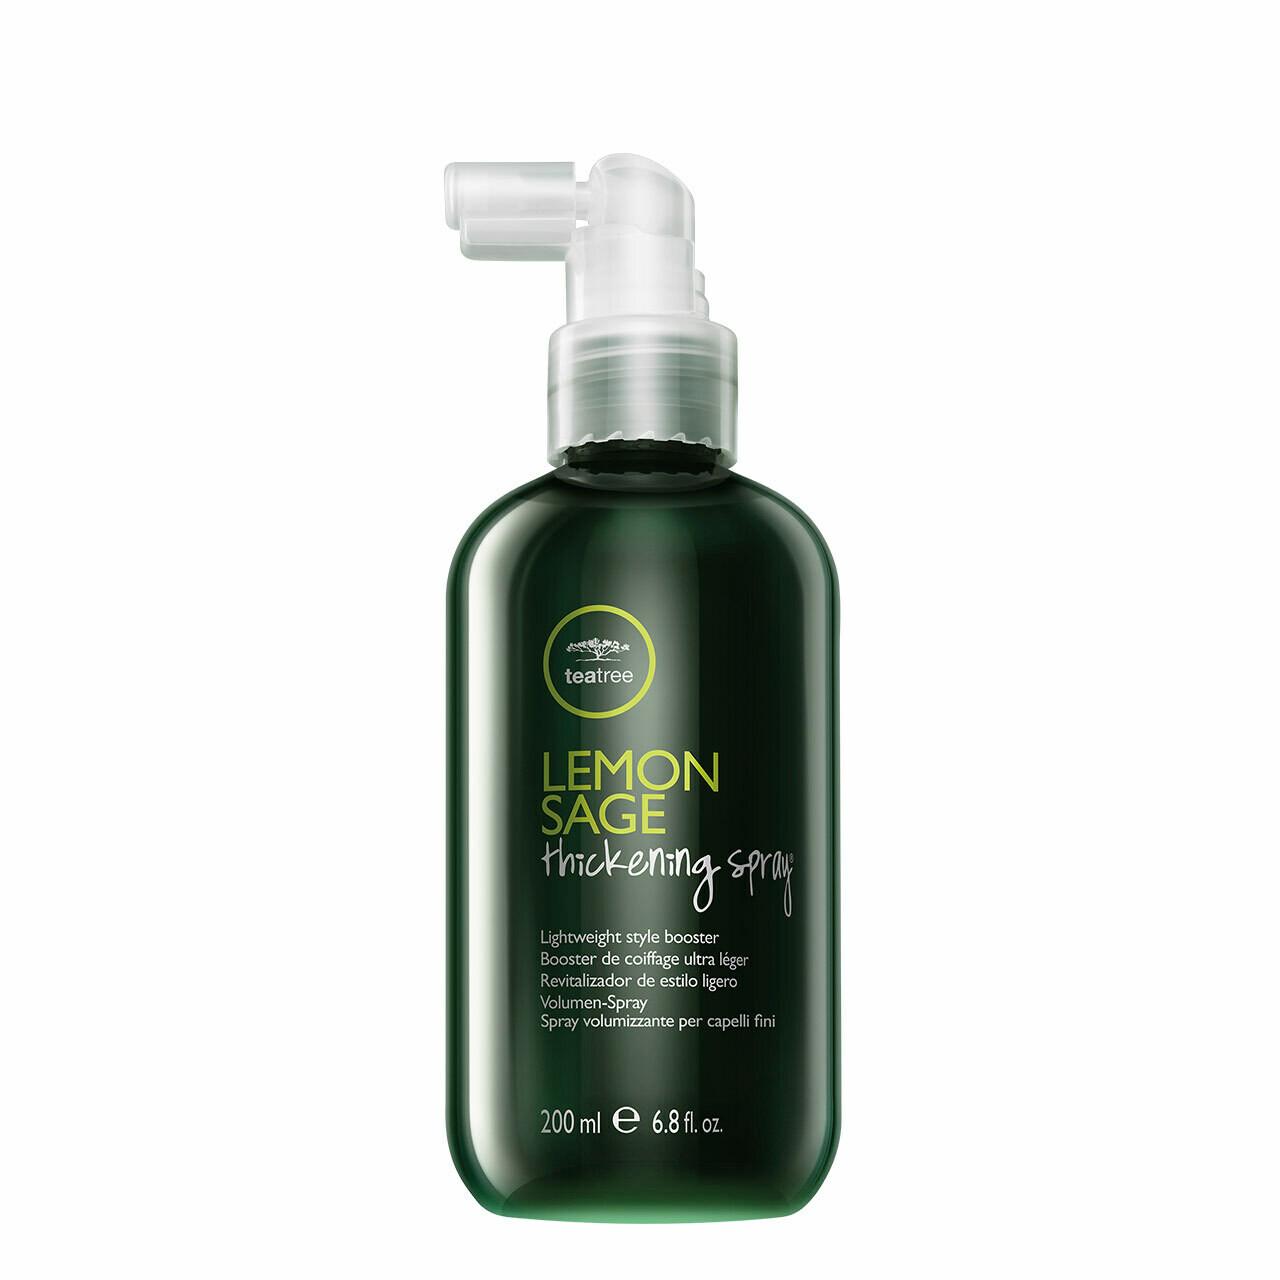 Lemon Sage Thickening Spray 200ml